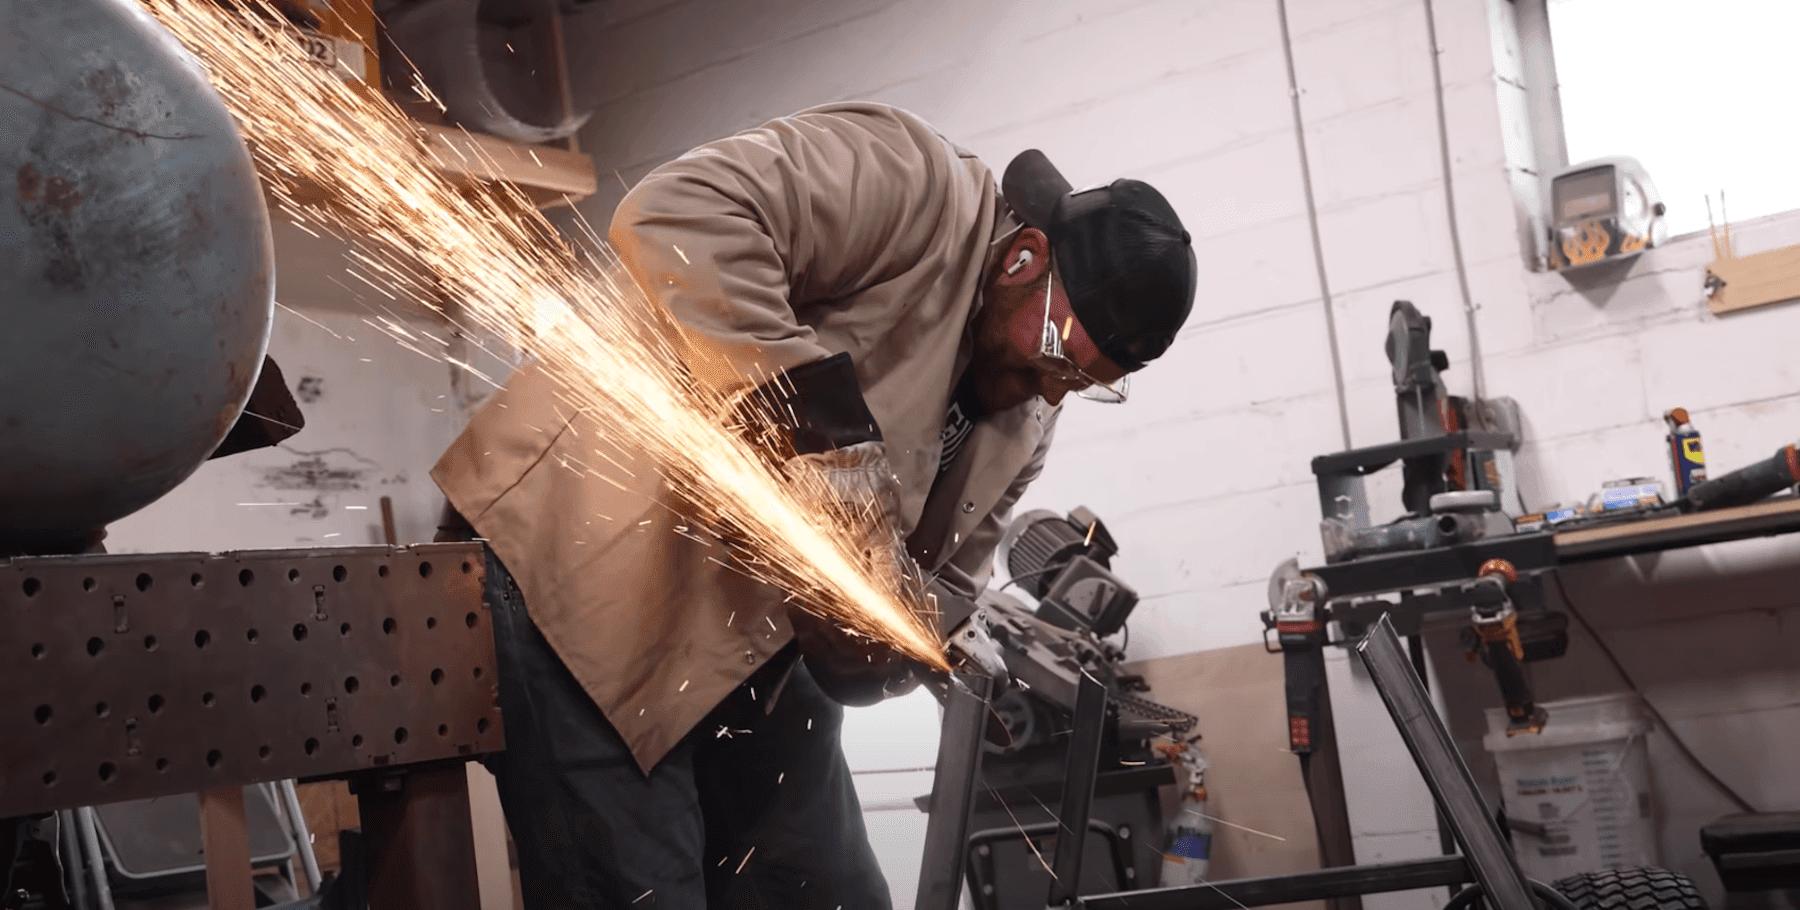 John Malecki welding